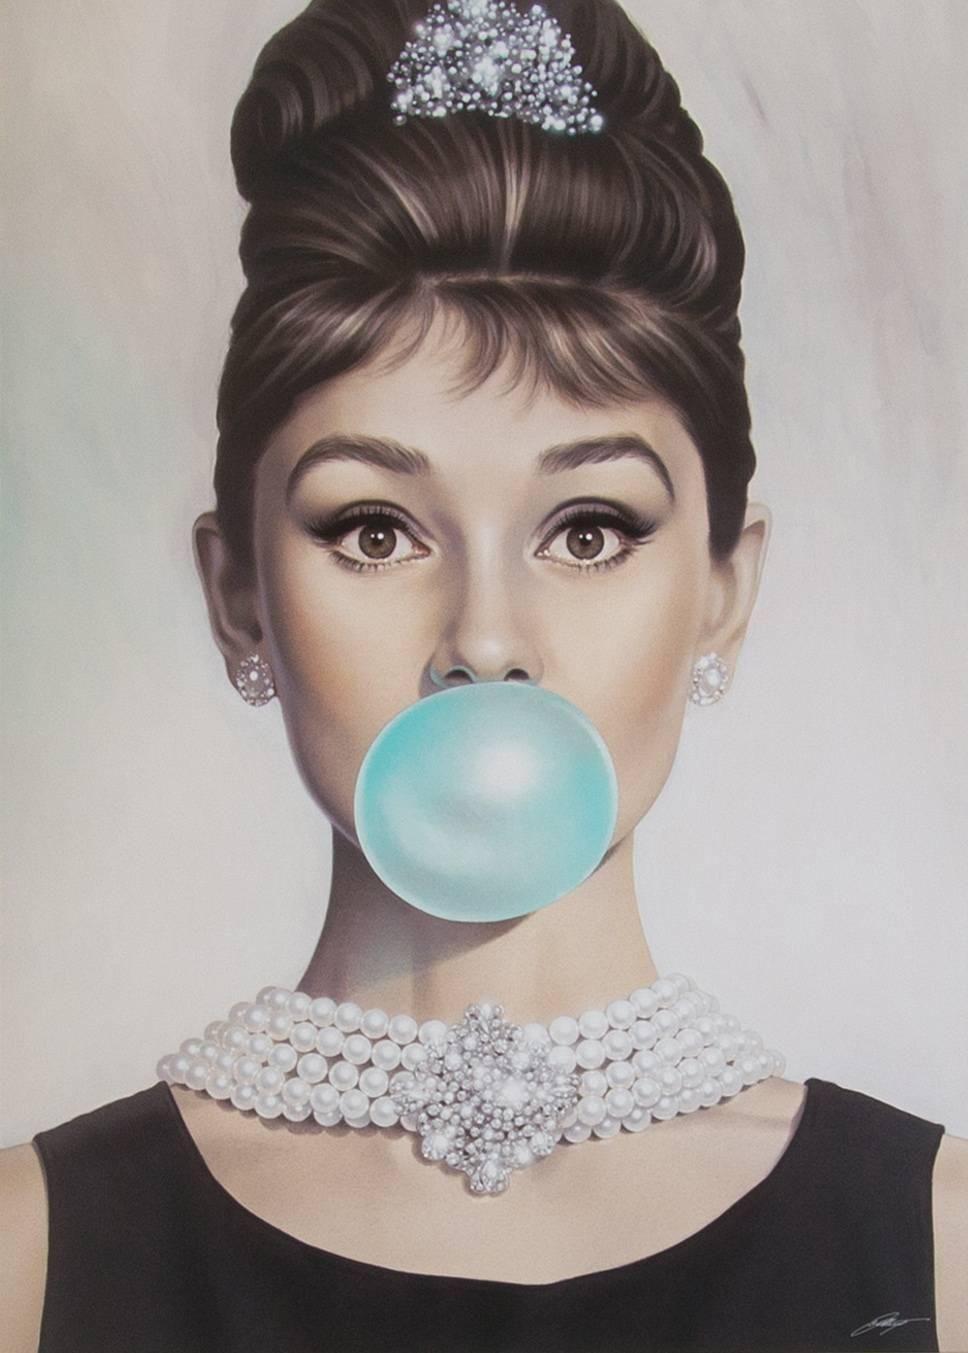 Michael Moebius Audrey Tiffany Blue 1stdibs Com Audrey Hepburn Wallpaper Audrey Hepburn Tiffany Blue